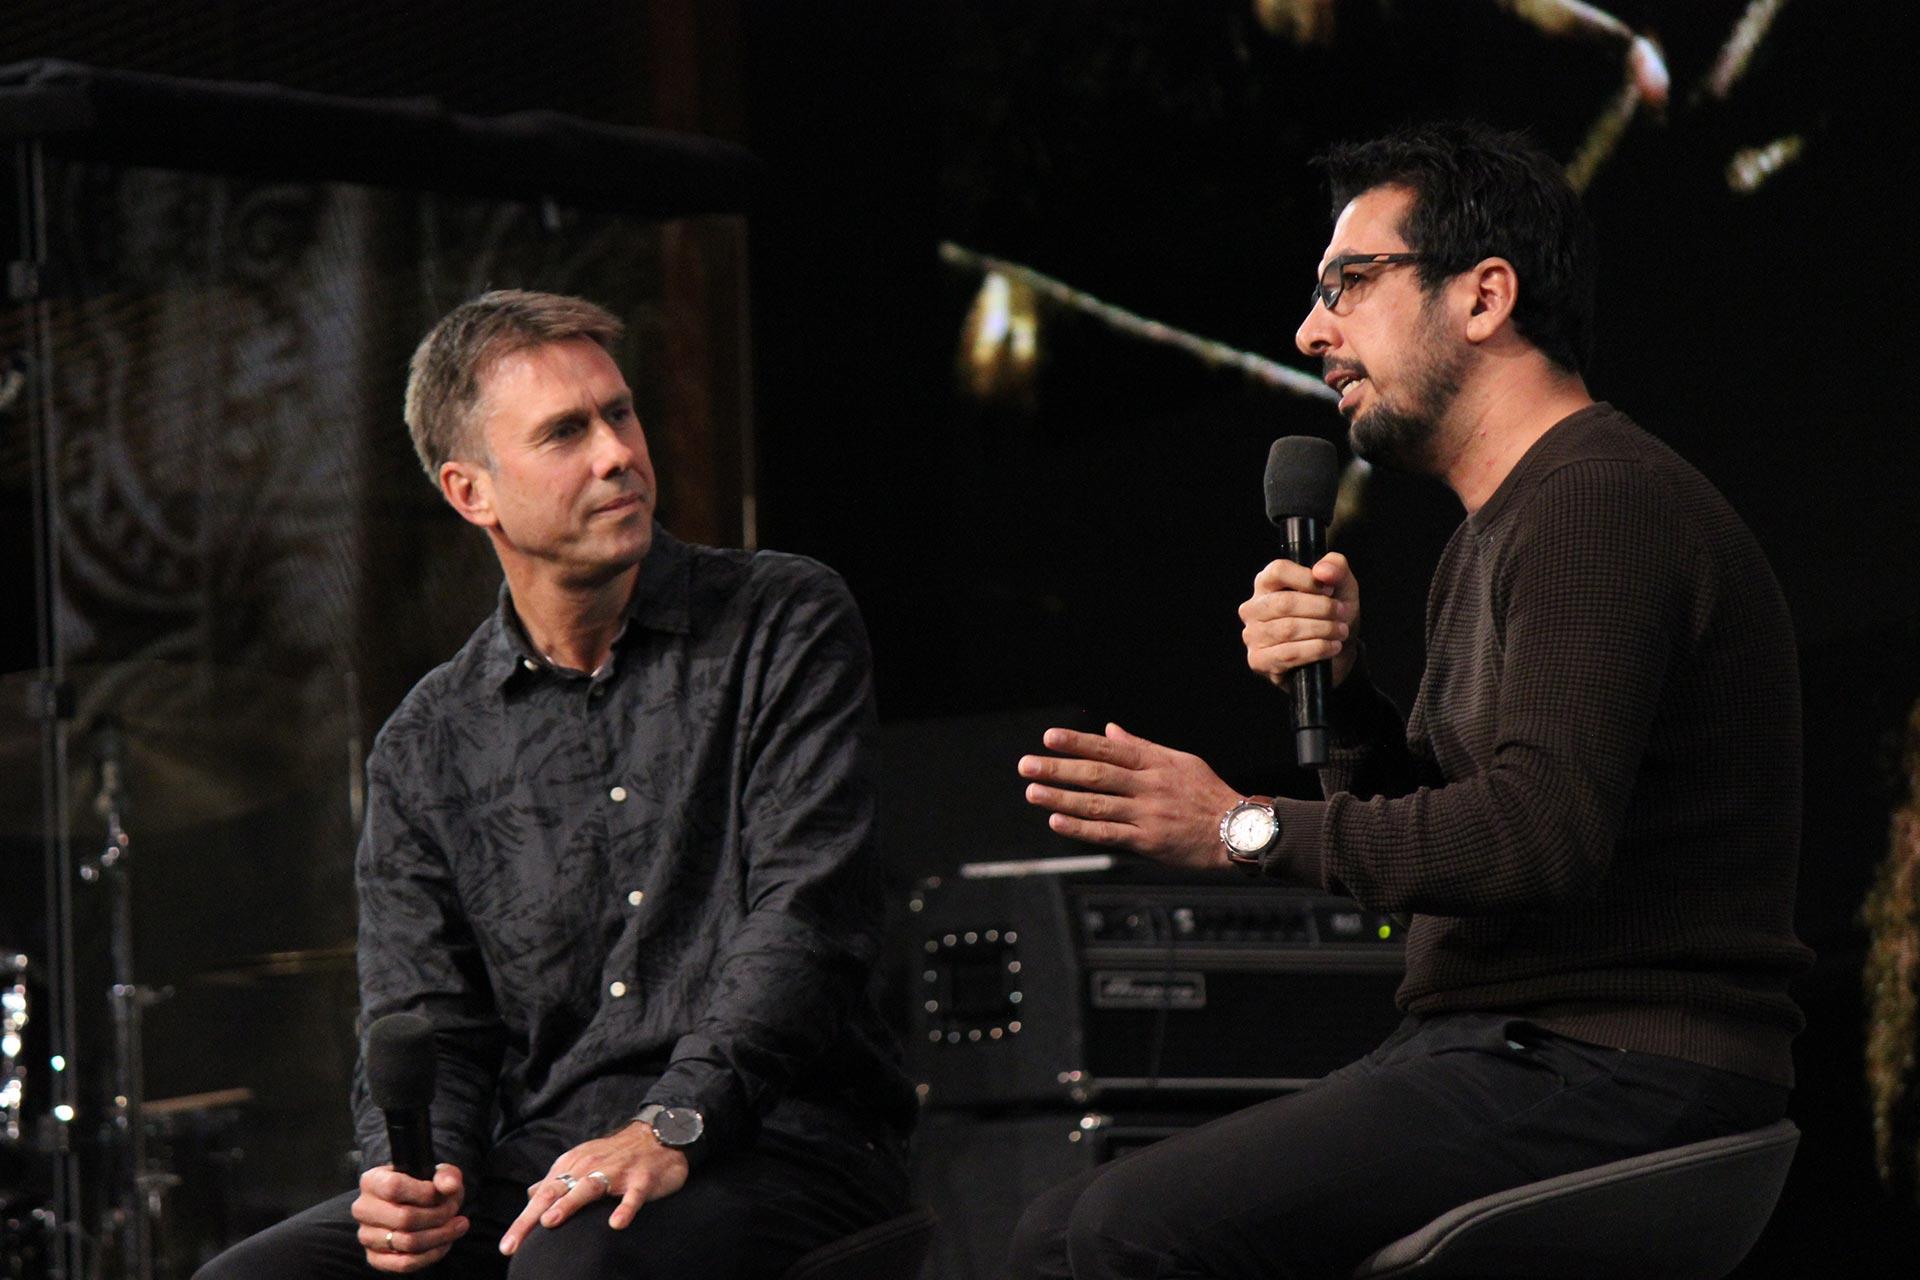 Pastor Jan Kjosavik intervjuer Daniel Magli.